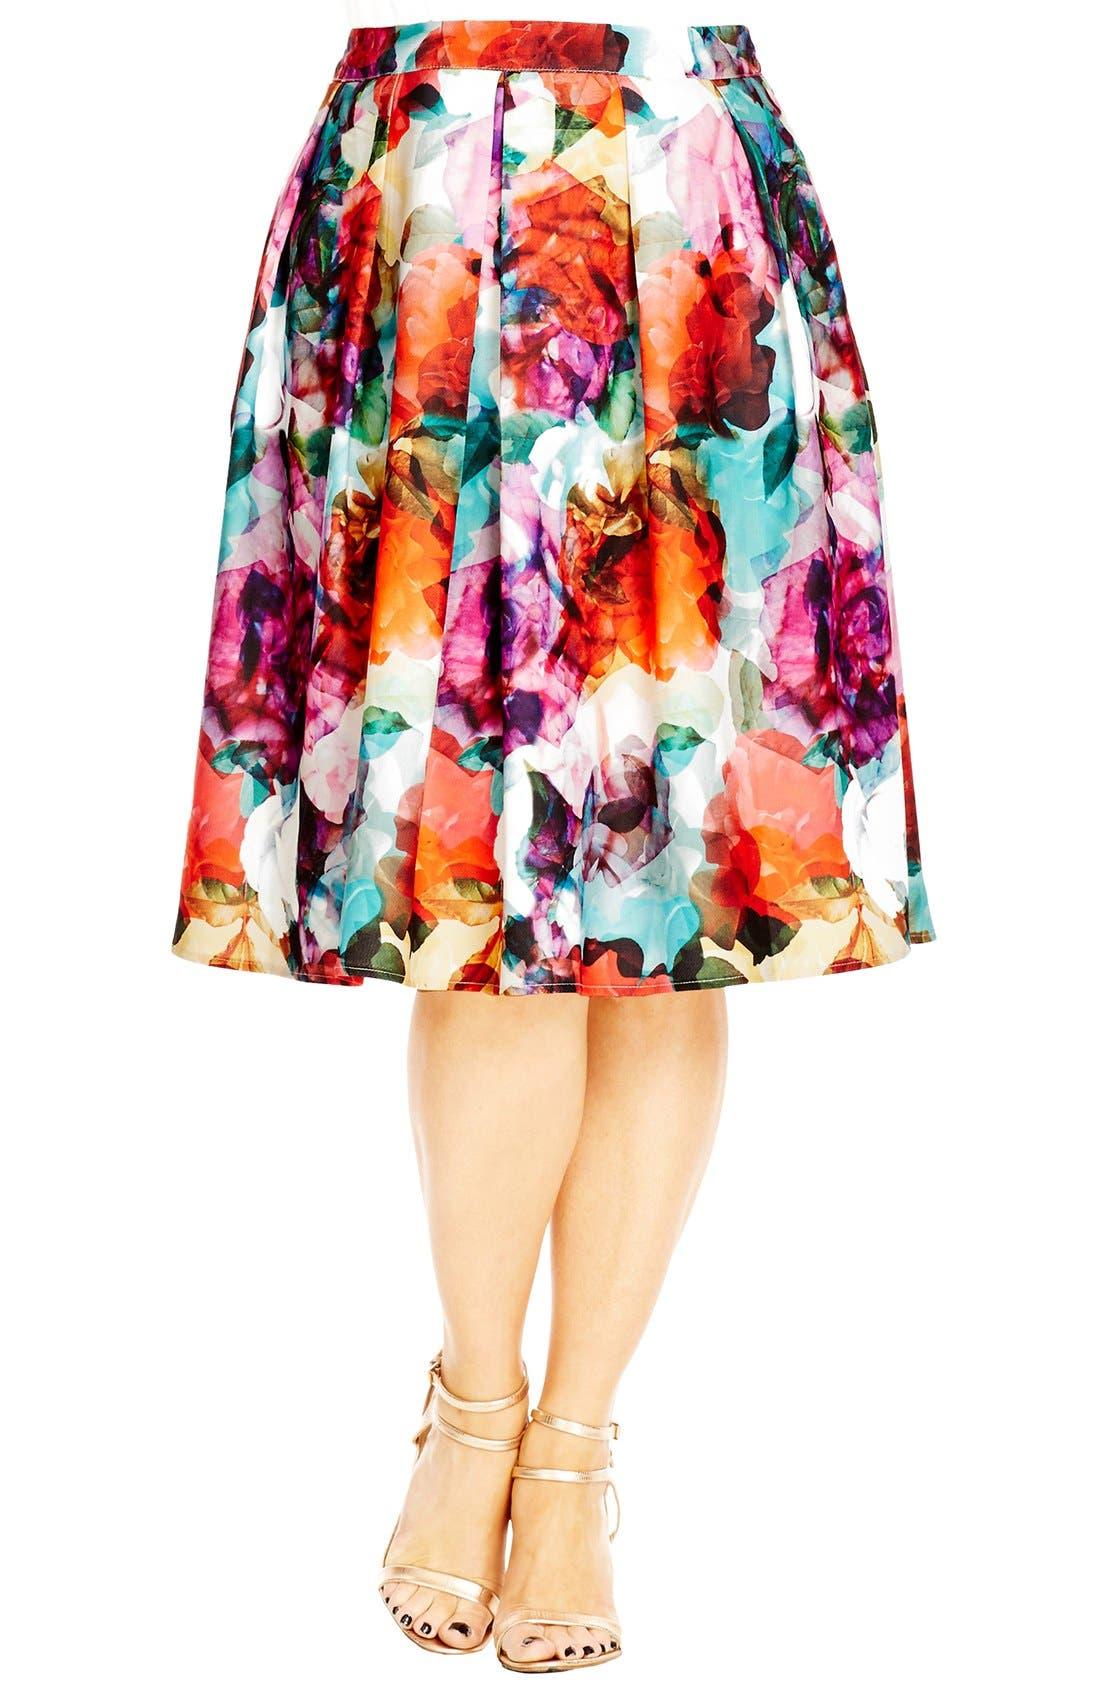 Main Image - City Chic 'Bright Pop' Floral Print Pleat Skirt (Plus Size)